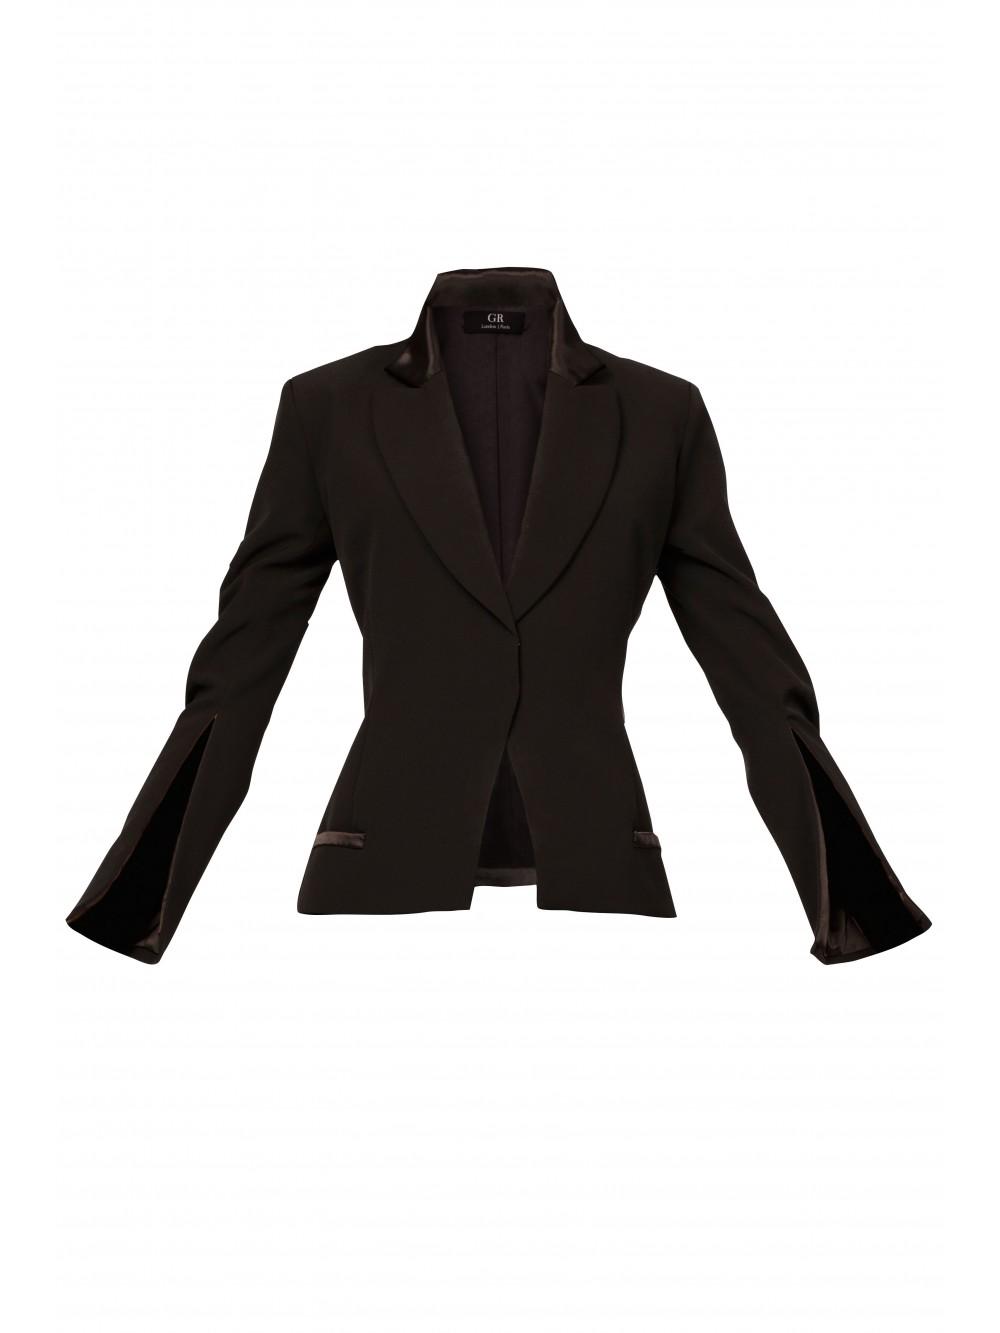 Satin trimmed blazer with split sleeves   Isild